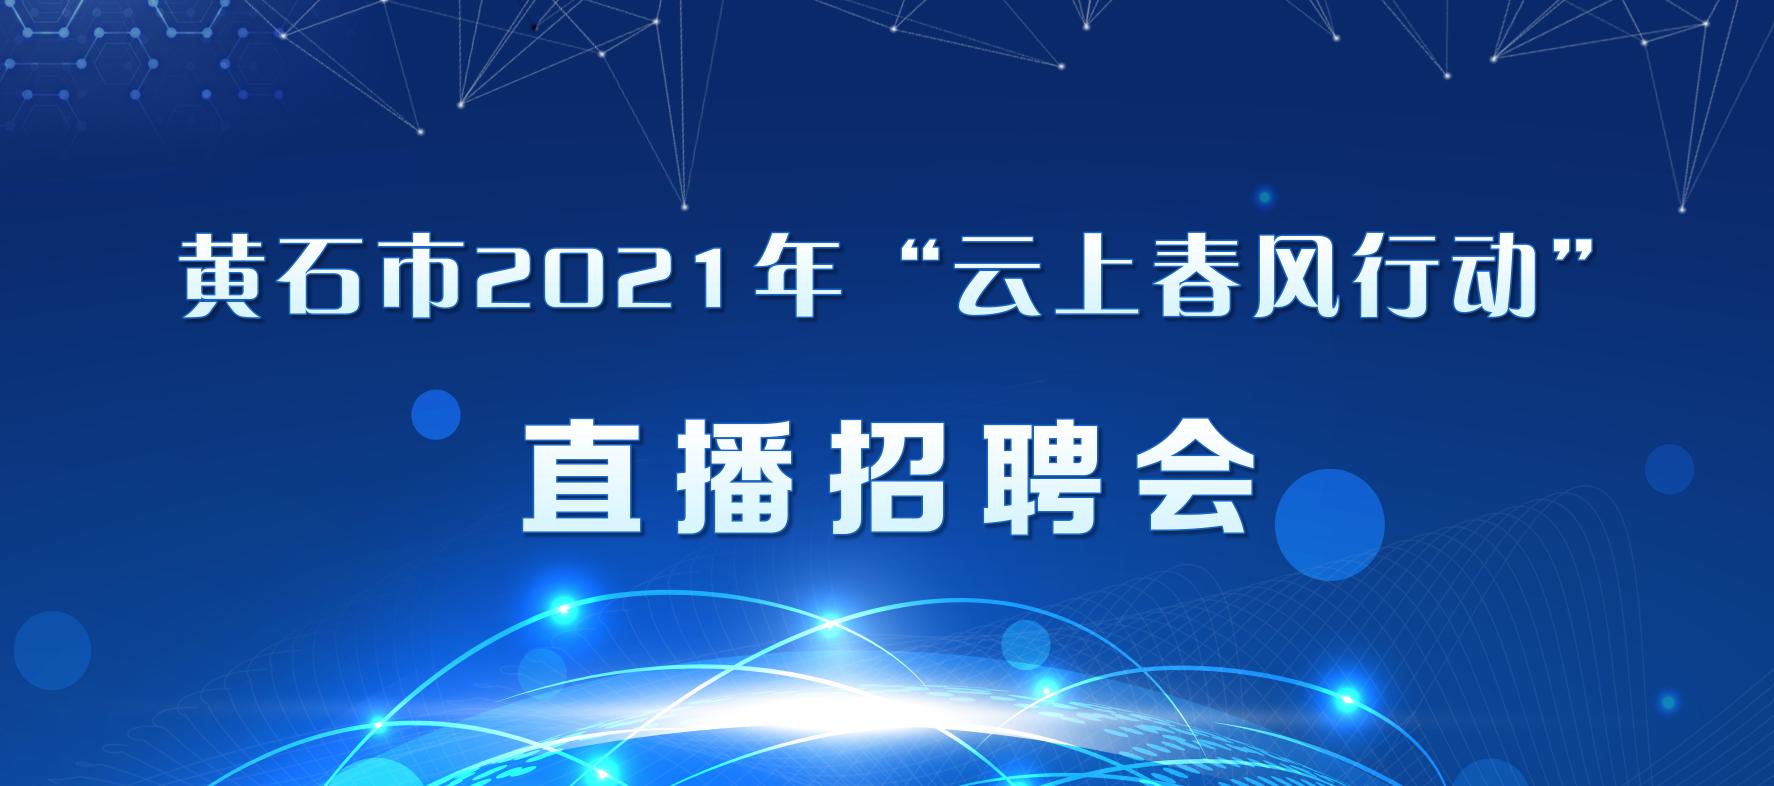 "【i撩】黄石市2021年""春风行动""网络直播招聘会开始啦"